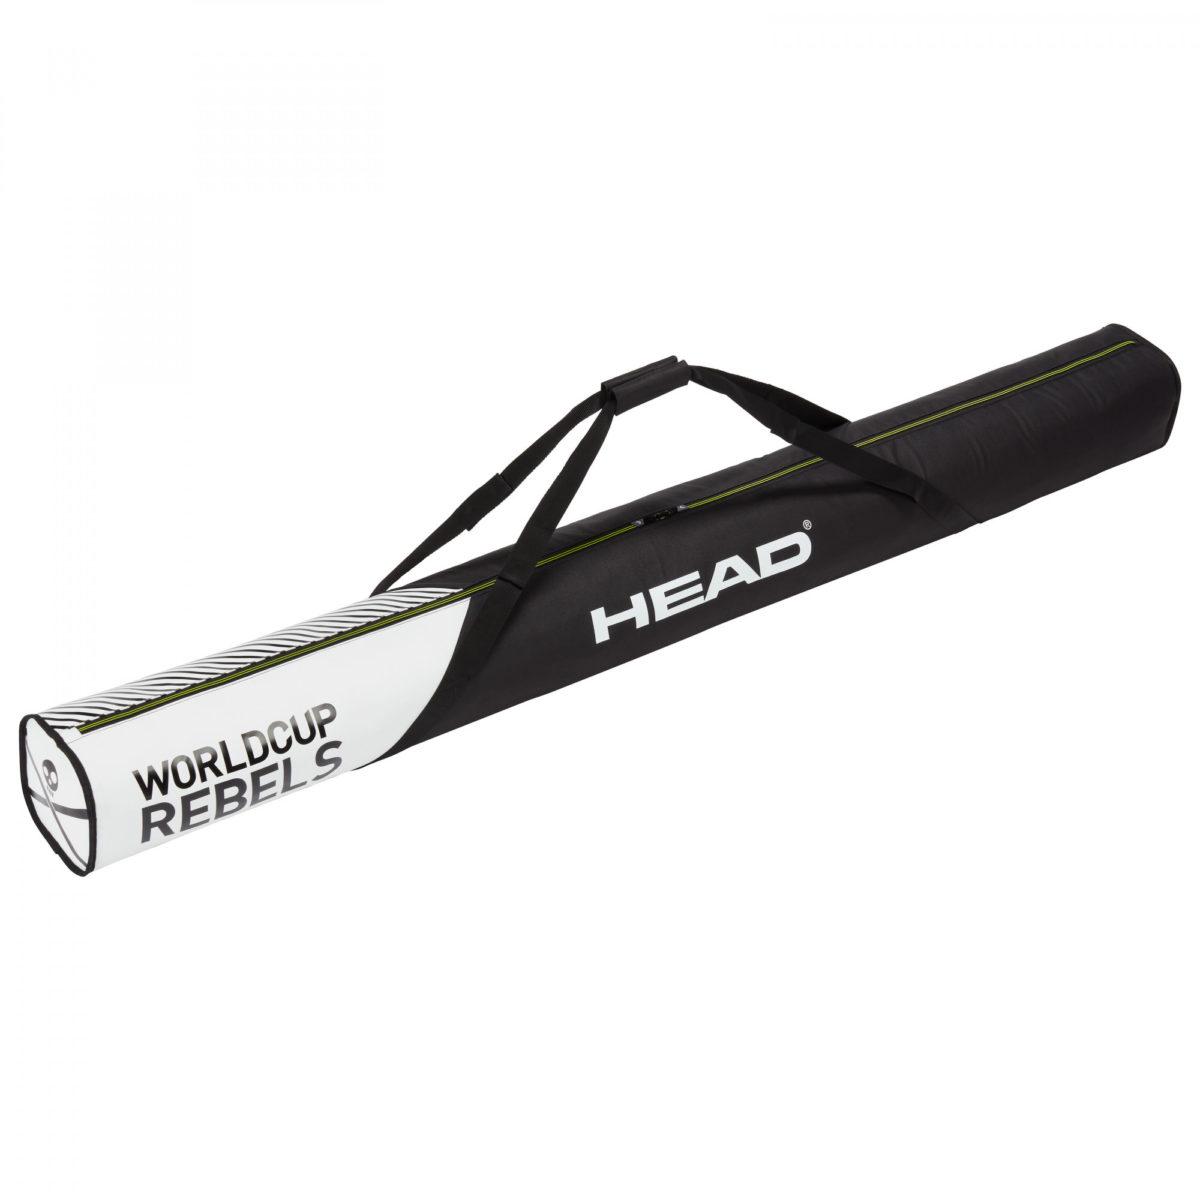 HEAD Redels Single Skibag Чехол на 1 пару лыж  383939 - 1